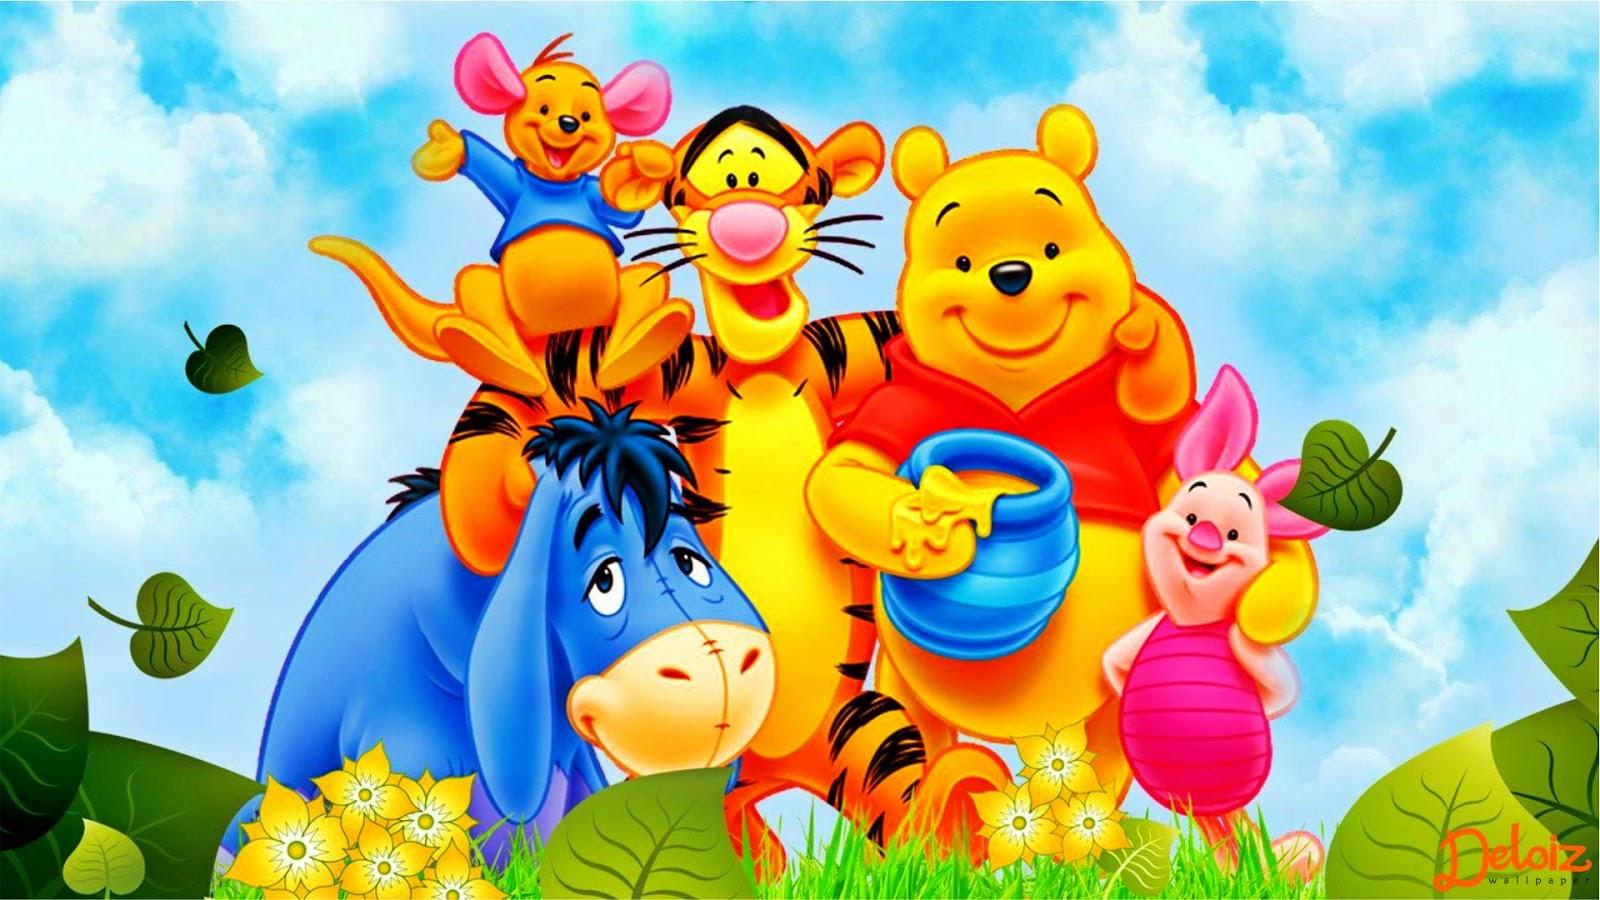 Tazmania Wallpaper Iphone 10 Wallpaper Winnie The Pooh Hd Deloiz Wallpaper